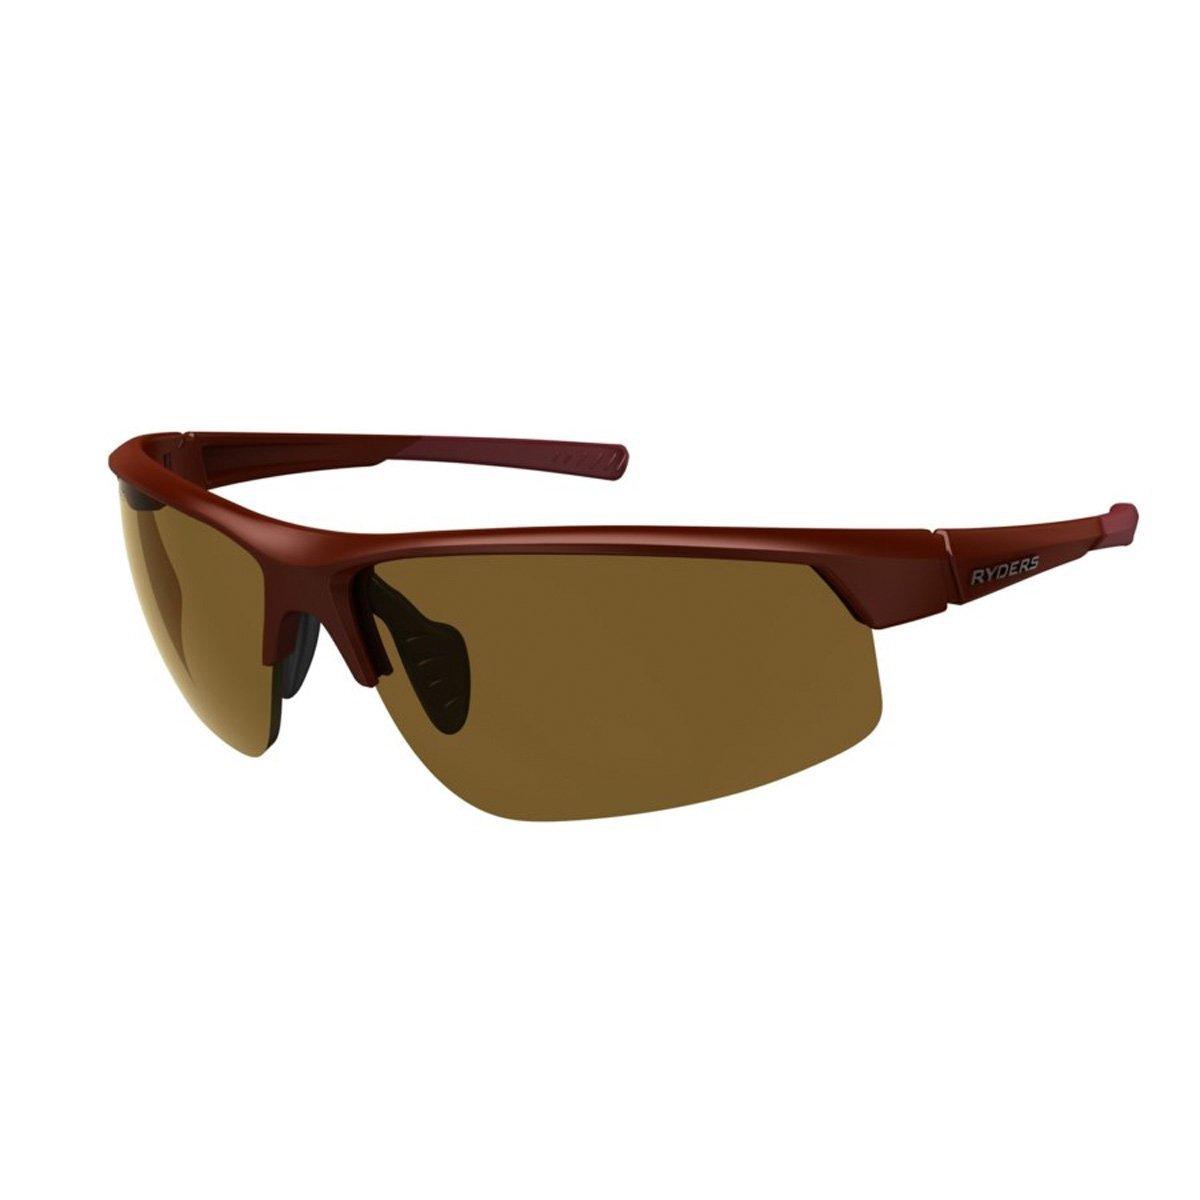 Ryders 眼鏡セーバー 偏光サングラス - カラー  MATTE DARK RED / BROWN LENS AR B07G13529F